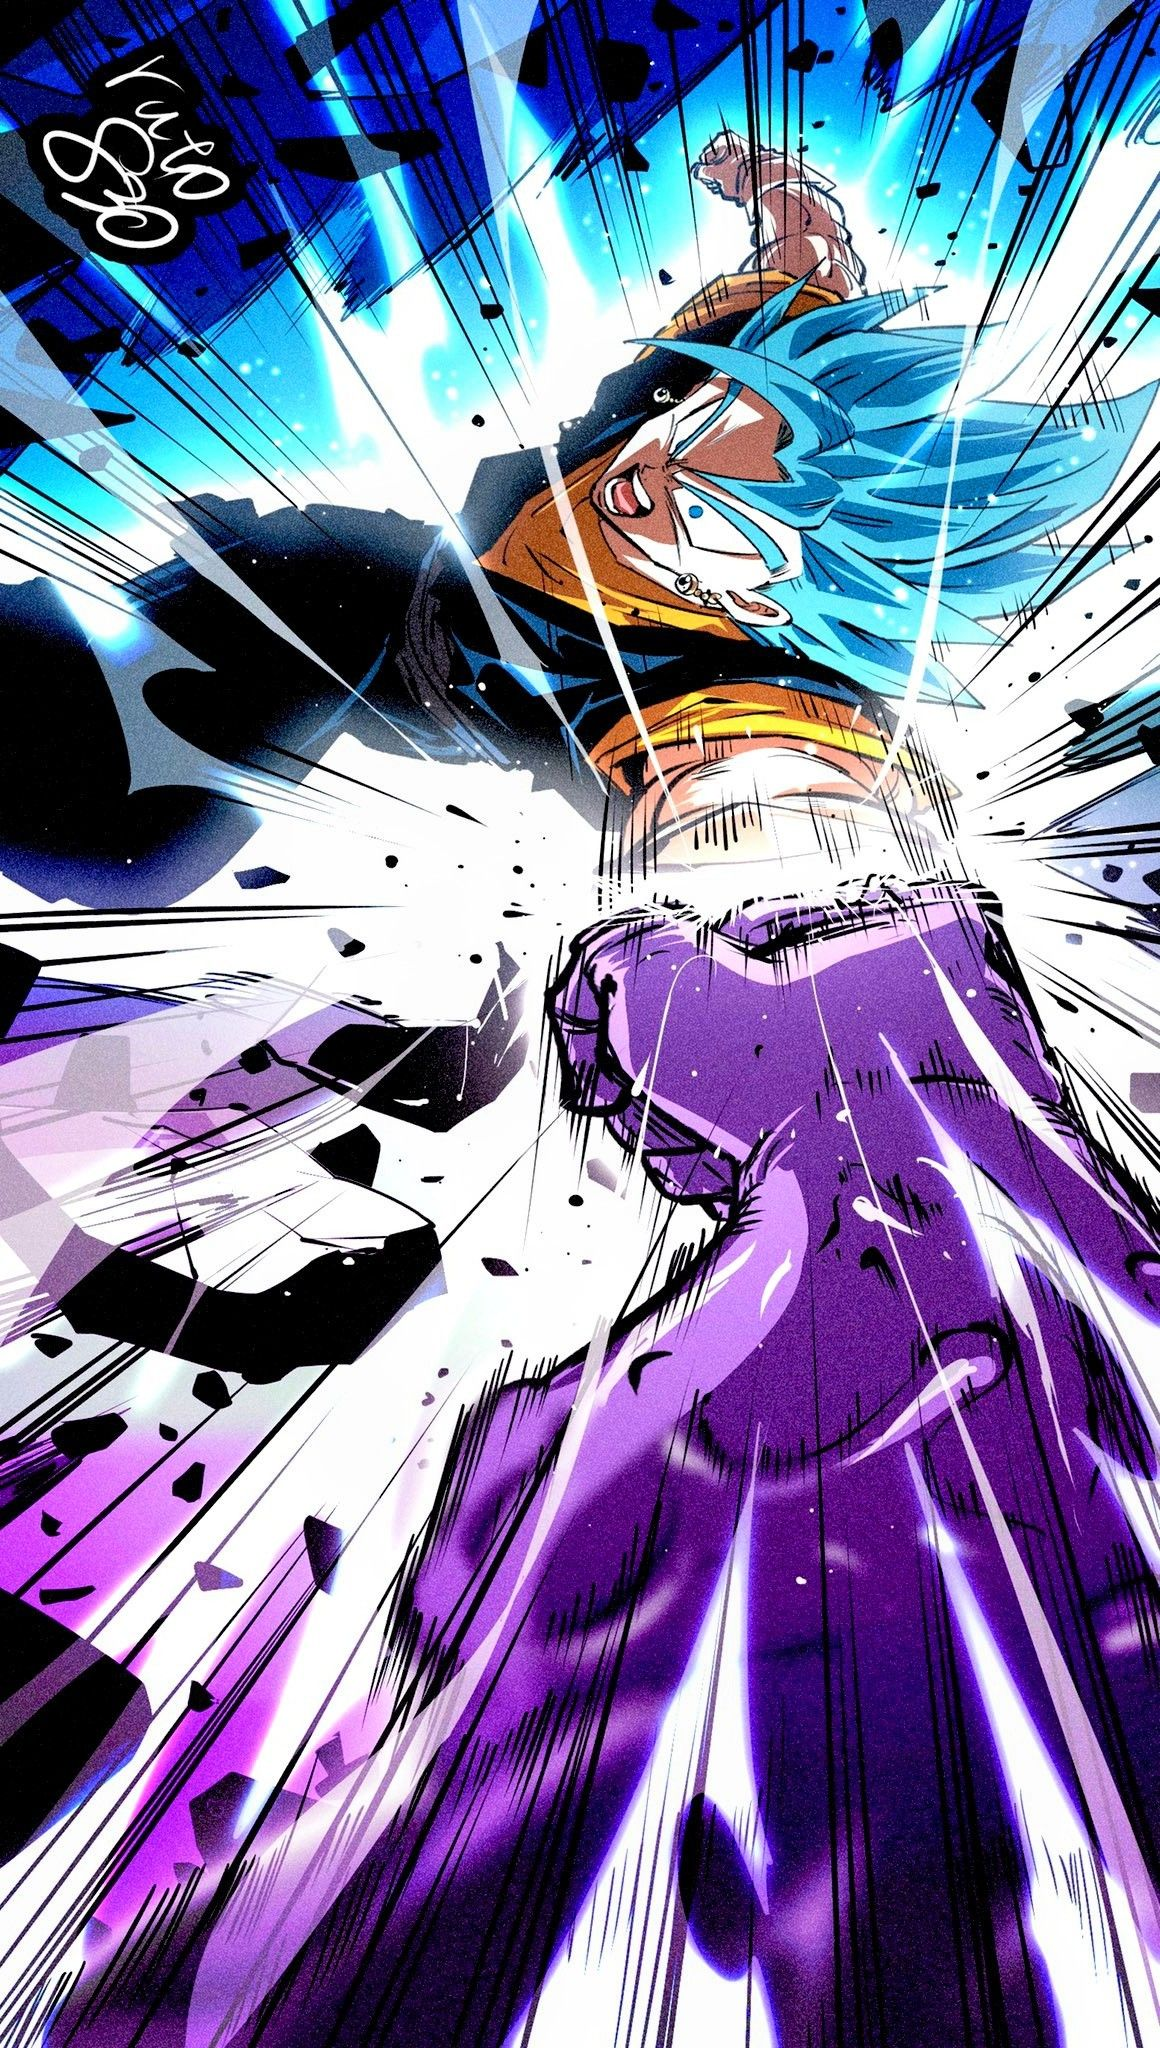 Vegito Blue Vs Fusion Zamasu Zamasu Perspective By Ruto830 Anime Dragon Ball Super Dragon Ball Artwork Dragon Ball Image